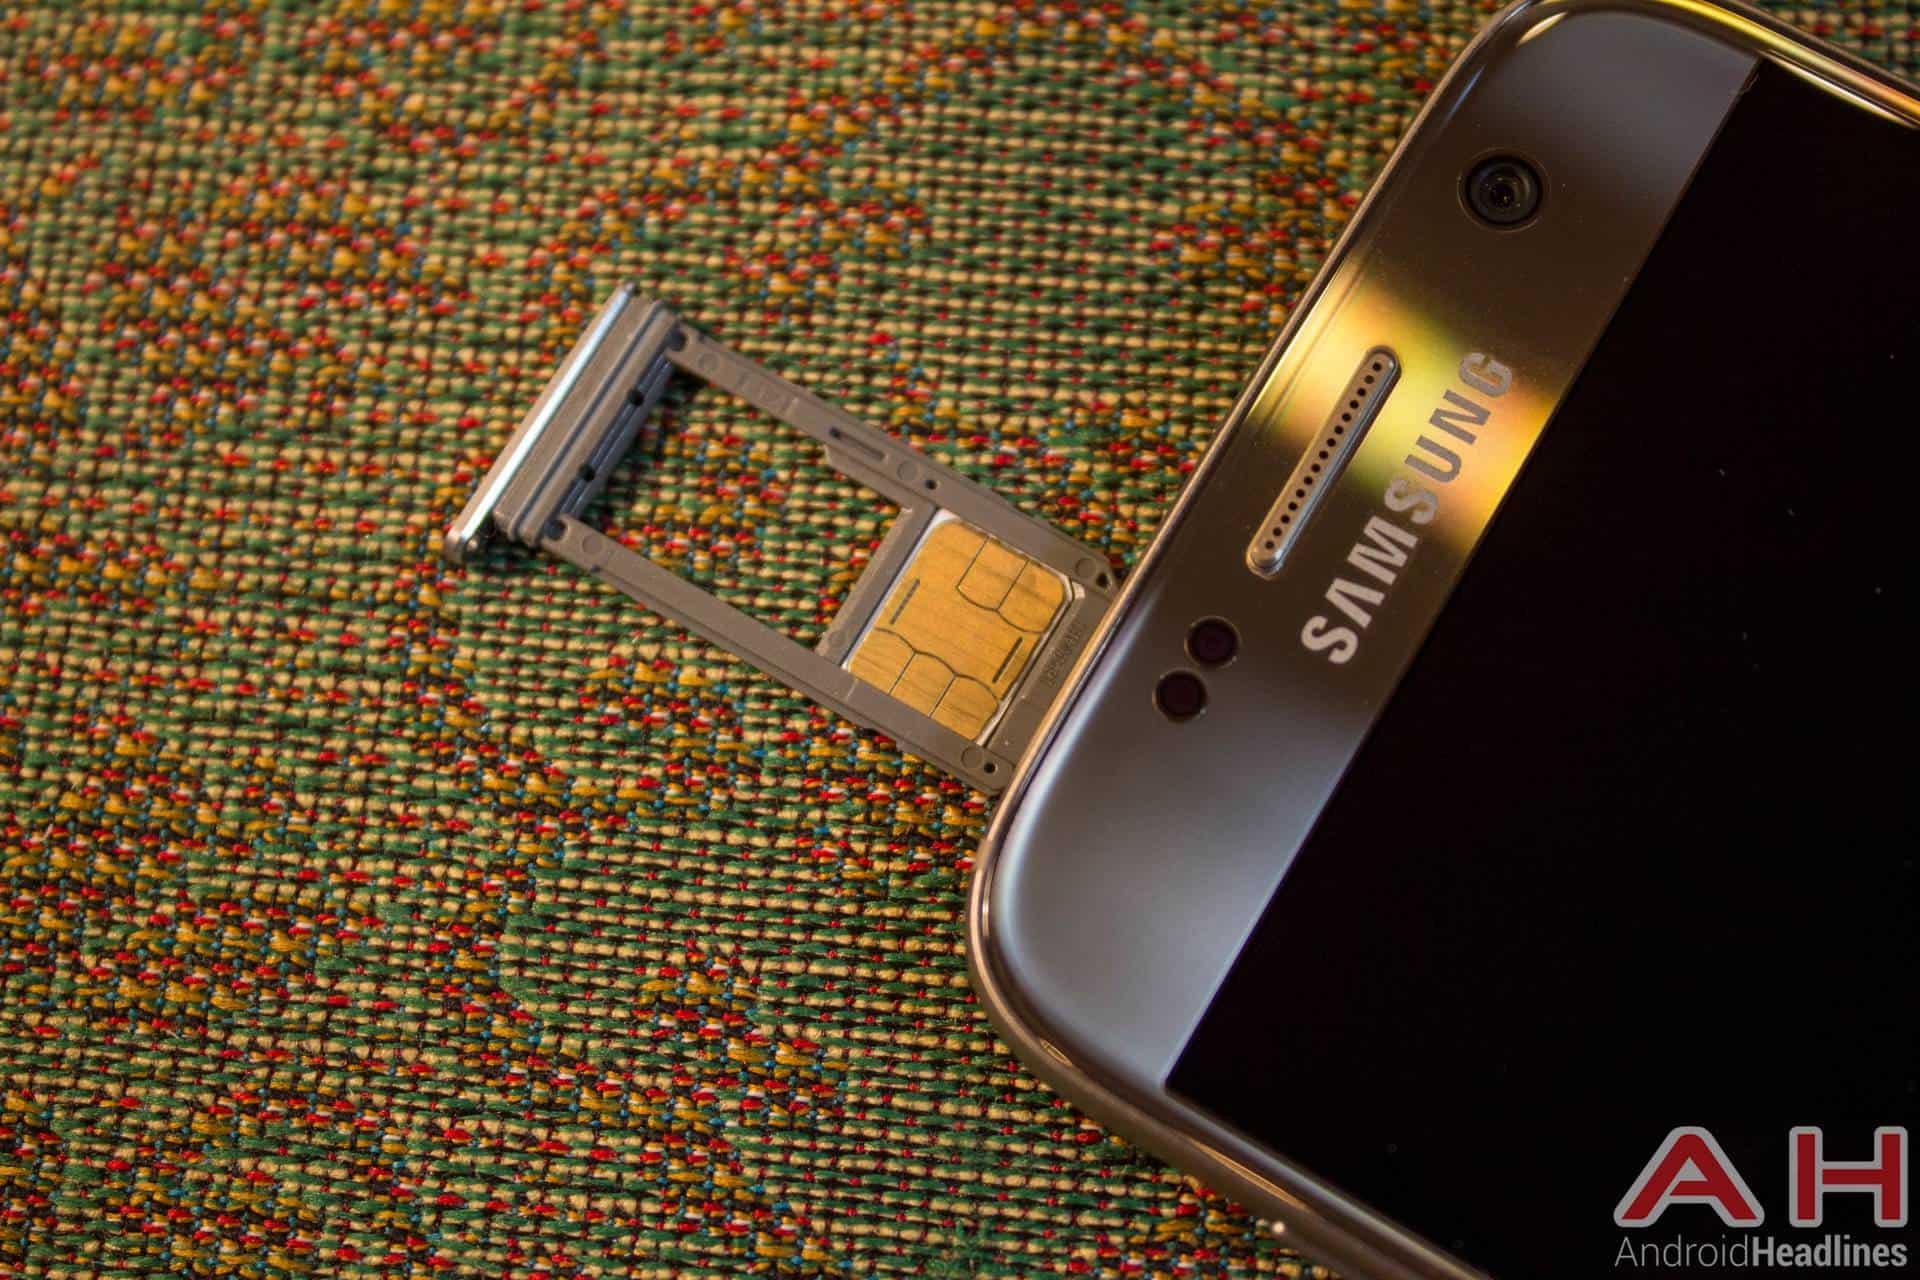 Samsung-Galaxy-S7-Gold-AH-NS-sim-card